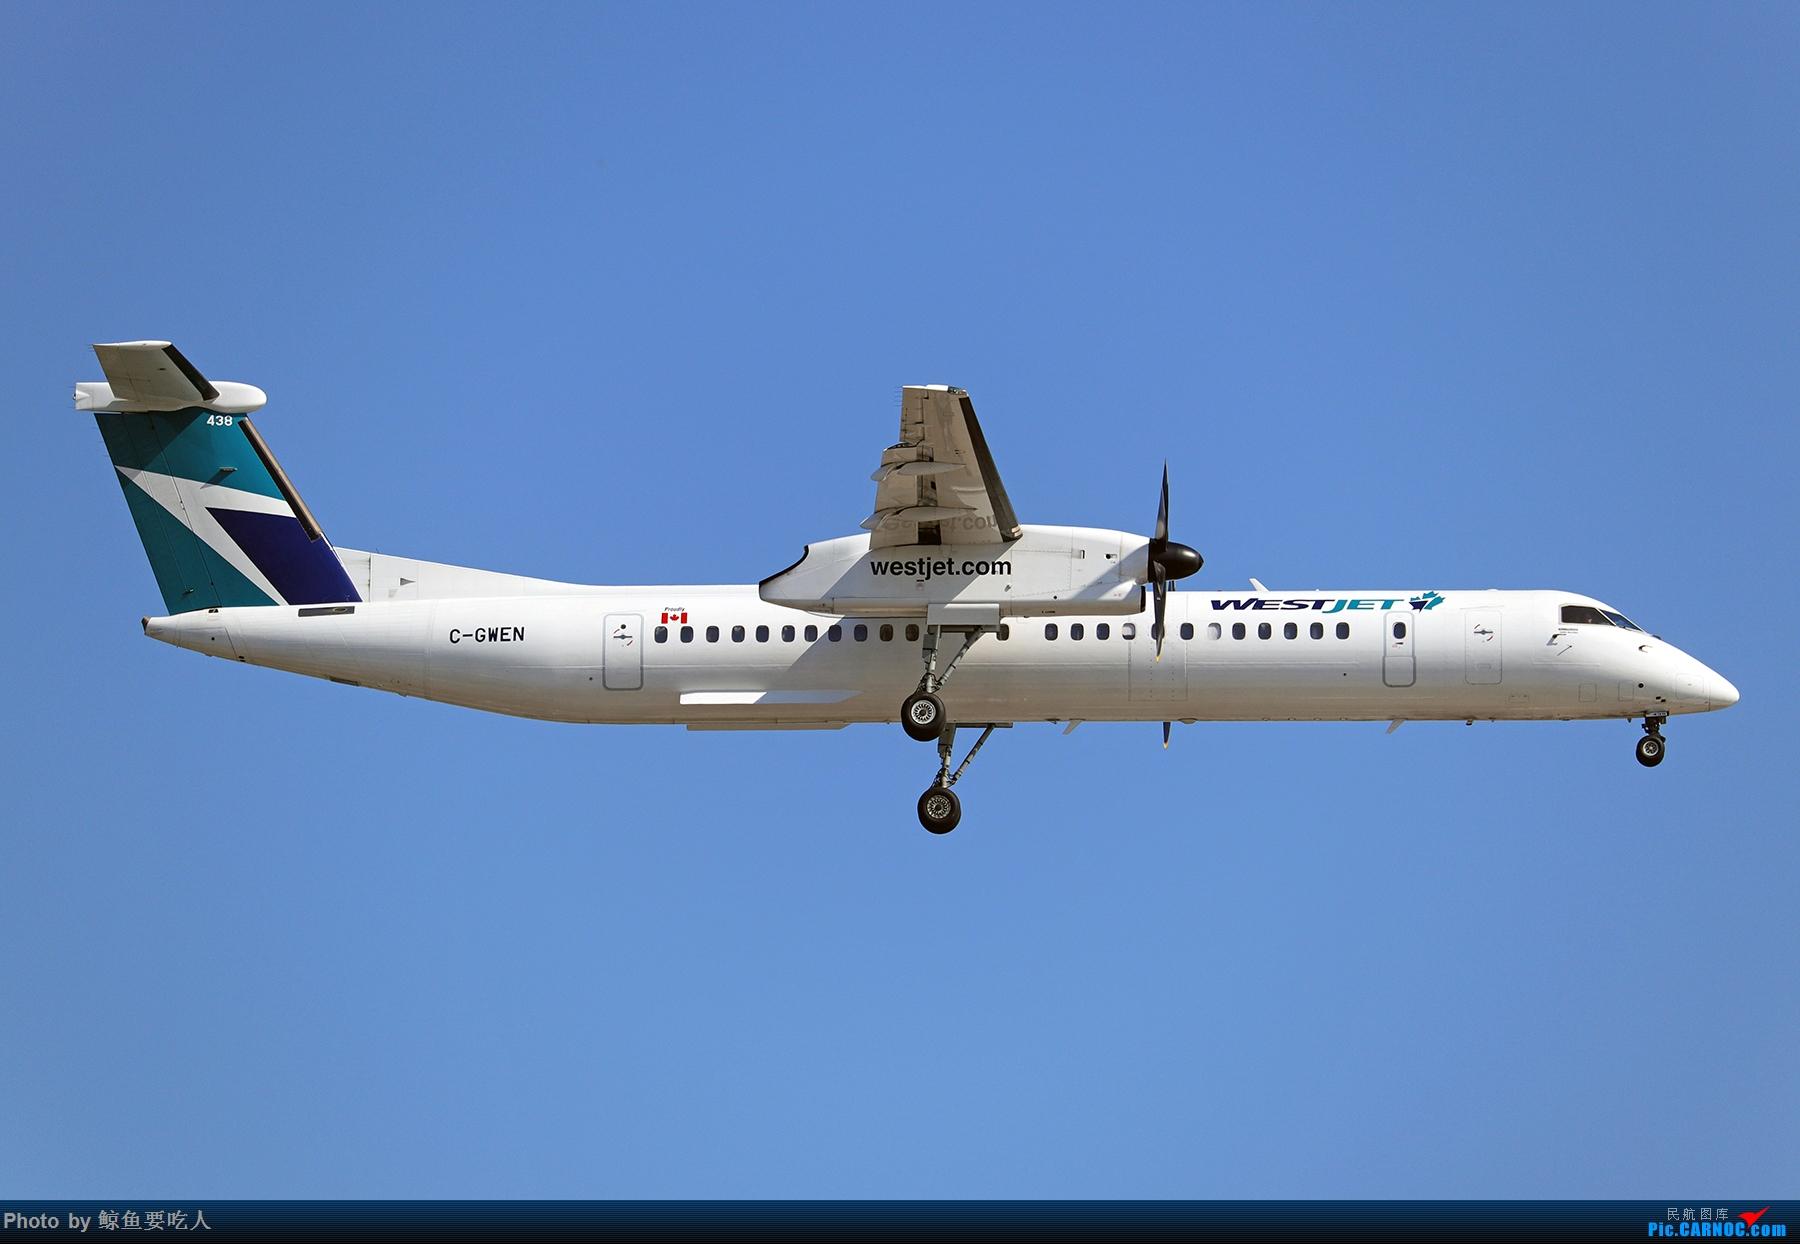 Re:[原创]【多图党】见证疫情后逐步的恢复,加拿大夏日多伦多皮尔逊机场拍机~ 乐见诸航空公司复航多伦多 DE HAVILLAN CANADA DHC-8-400 C-GWEN 多伦多皮尔逊国际机场